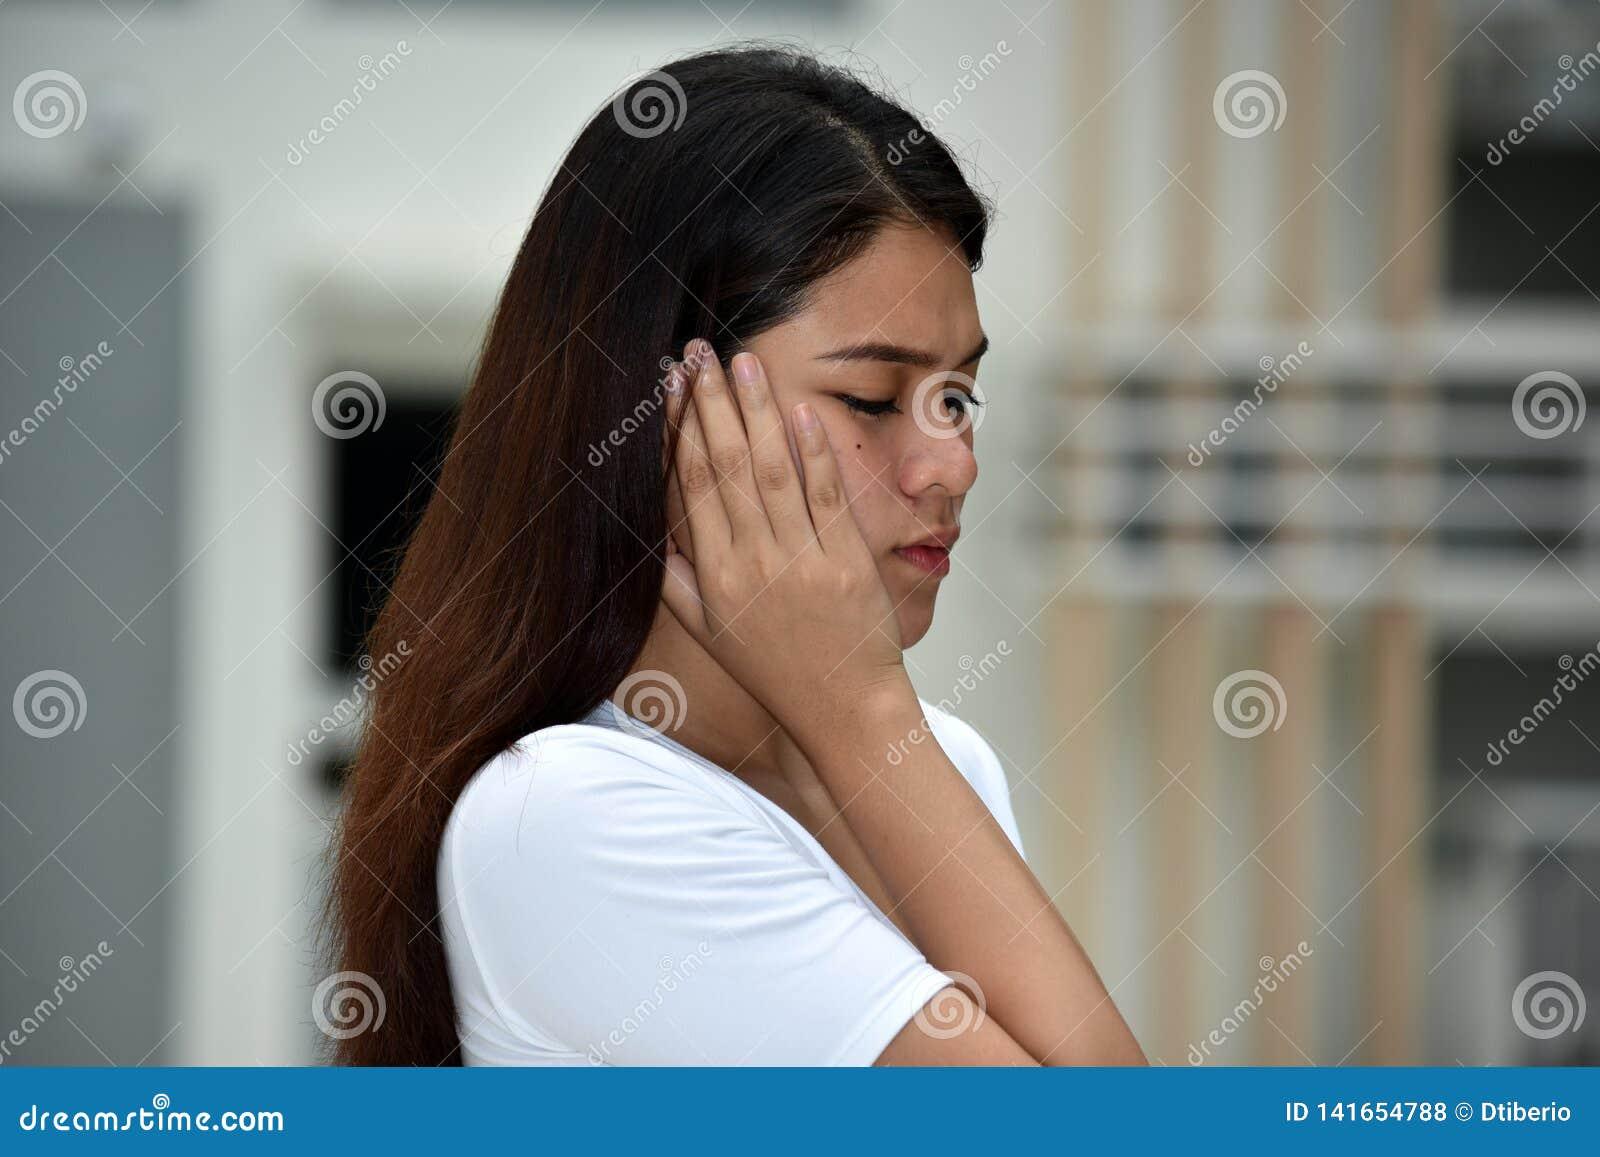 Filipina Adult Female Alone